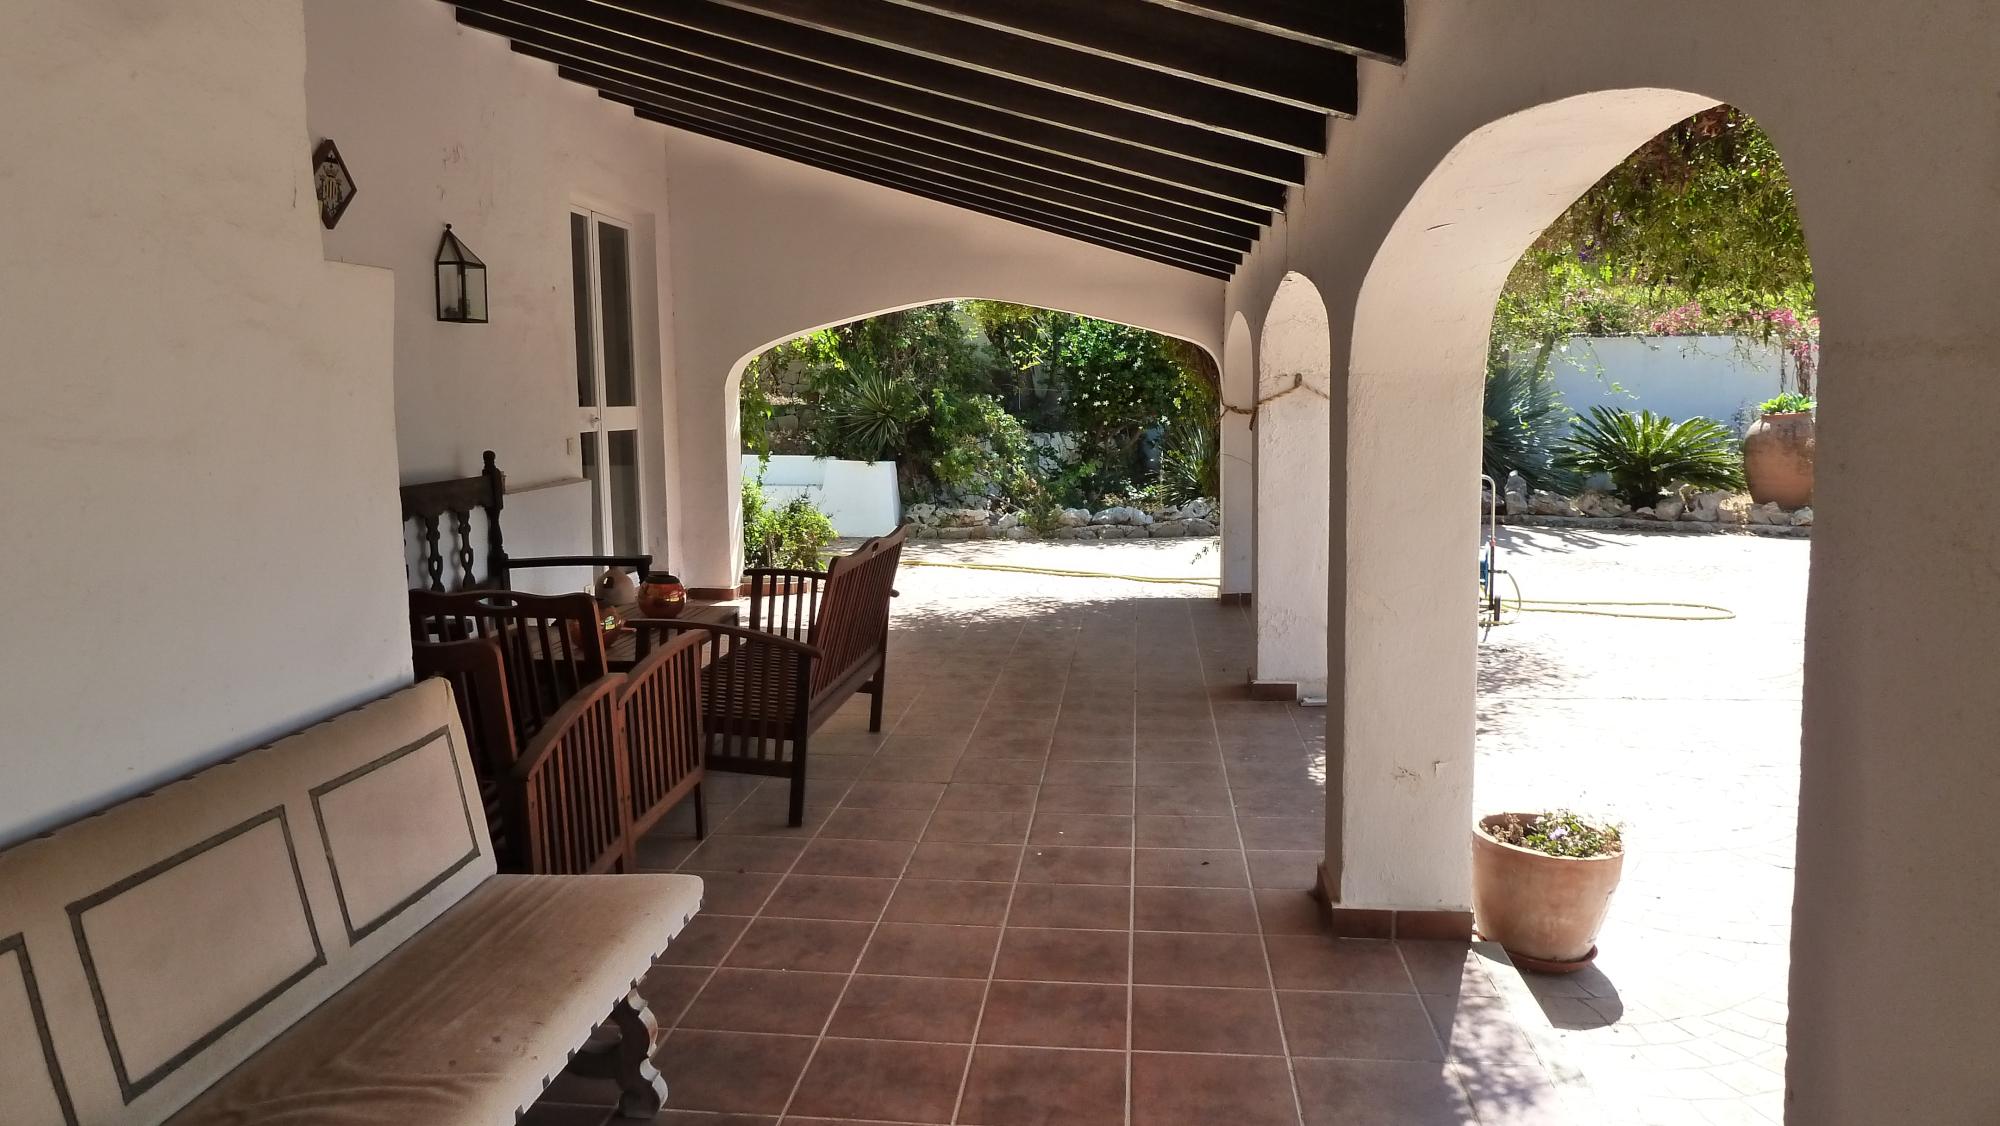 Finca en venta en benissa ref cr0954 - Casas en benissa ...